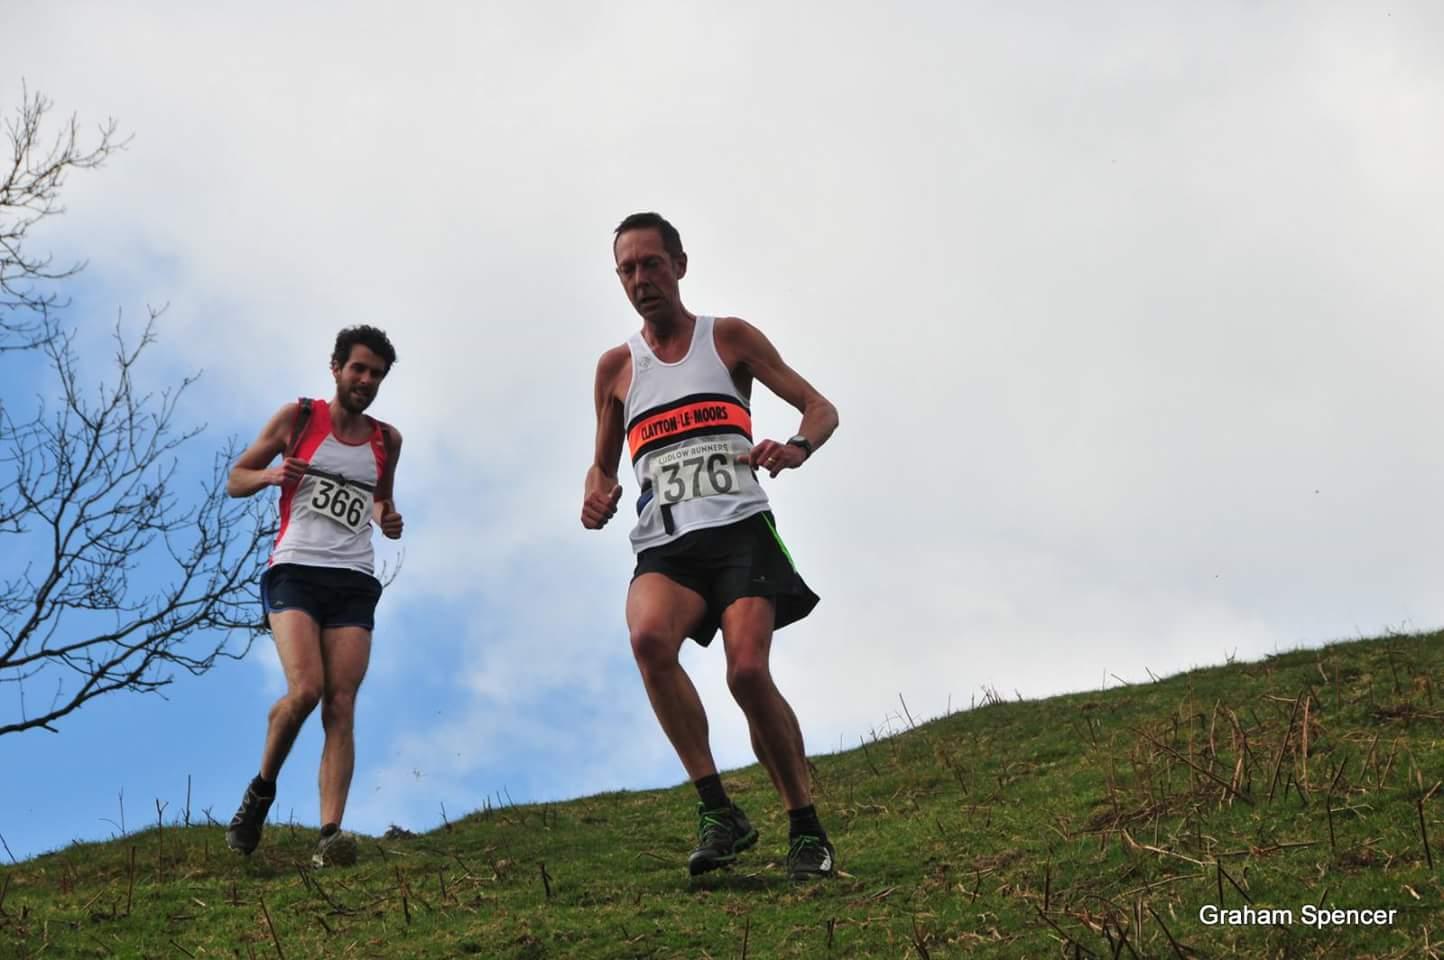 Mark Nutter in the Mynd Dragon fell race. Photo by Graham Spencer